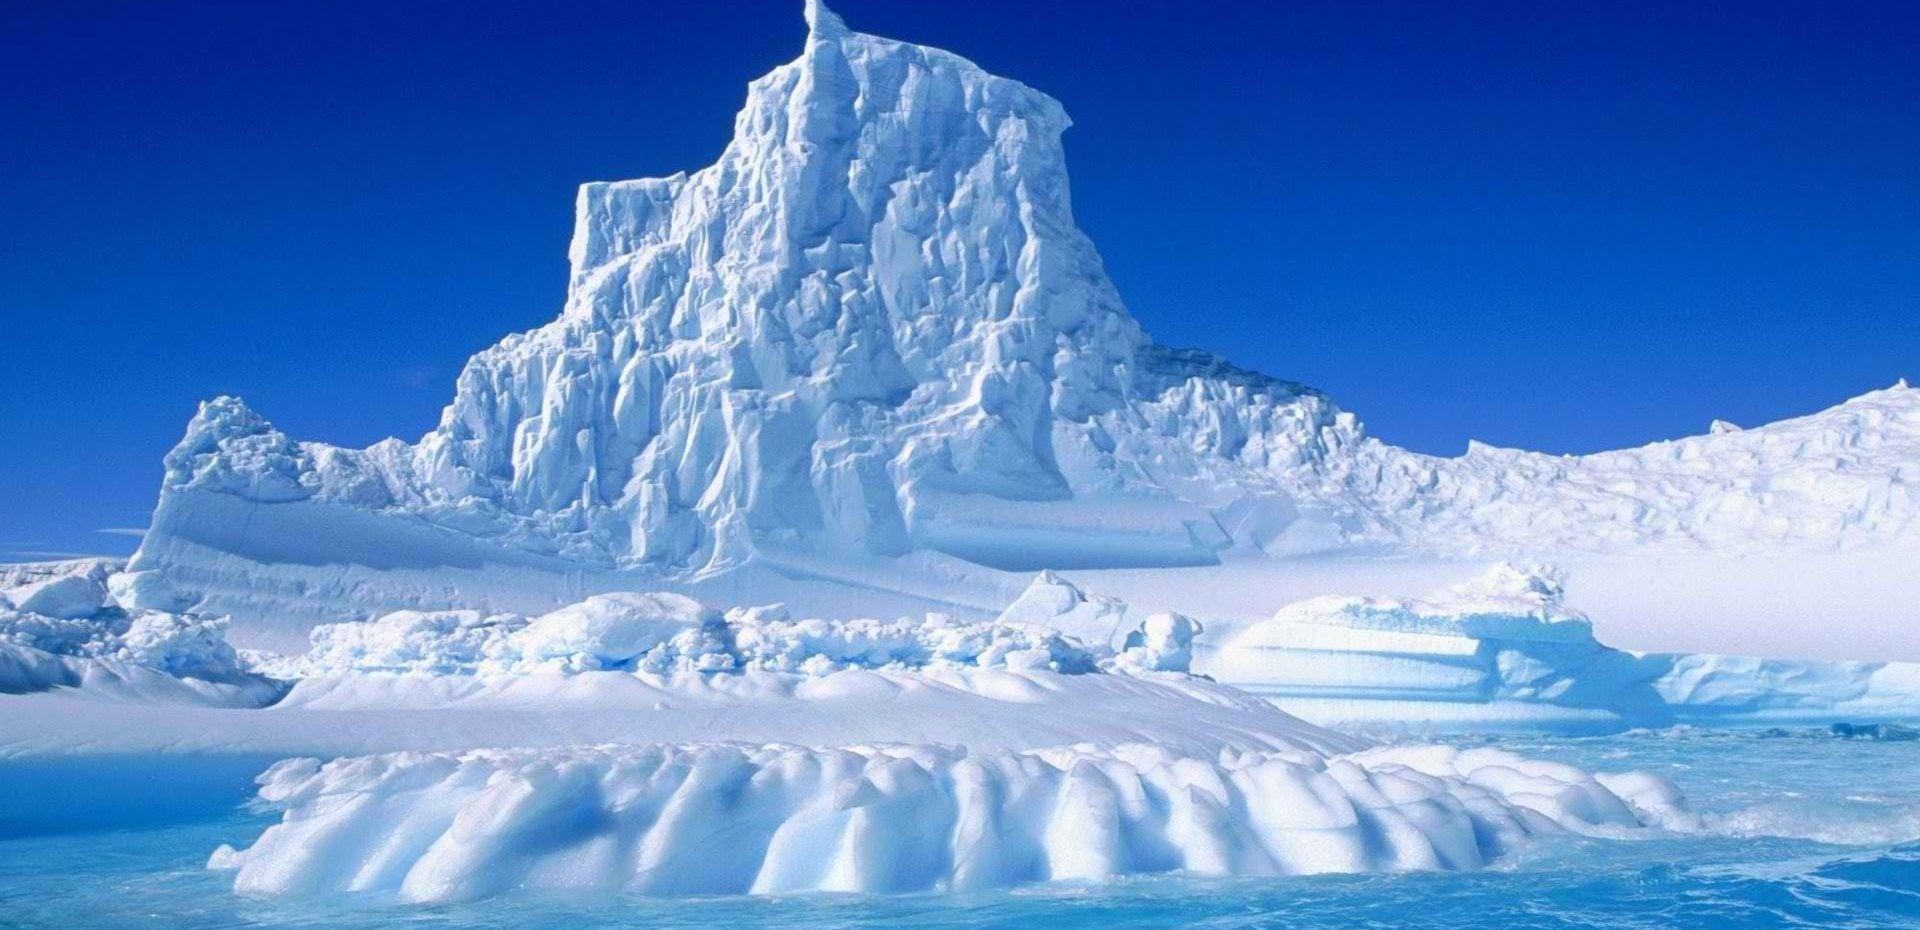 تحولات در قطب جنوب